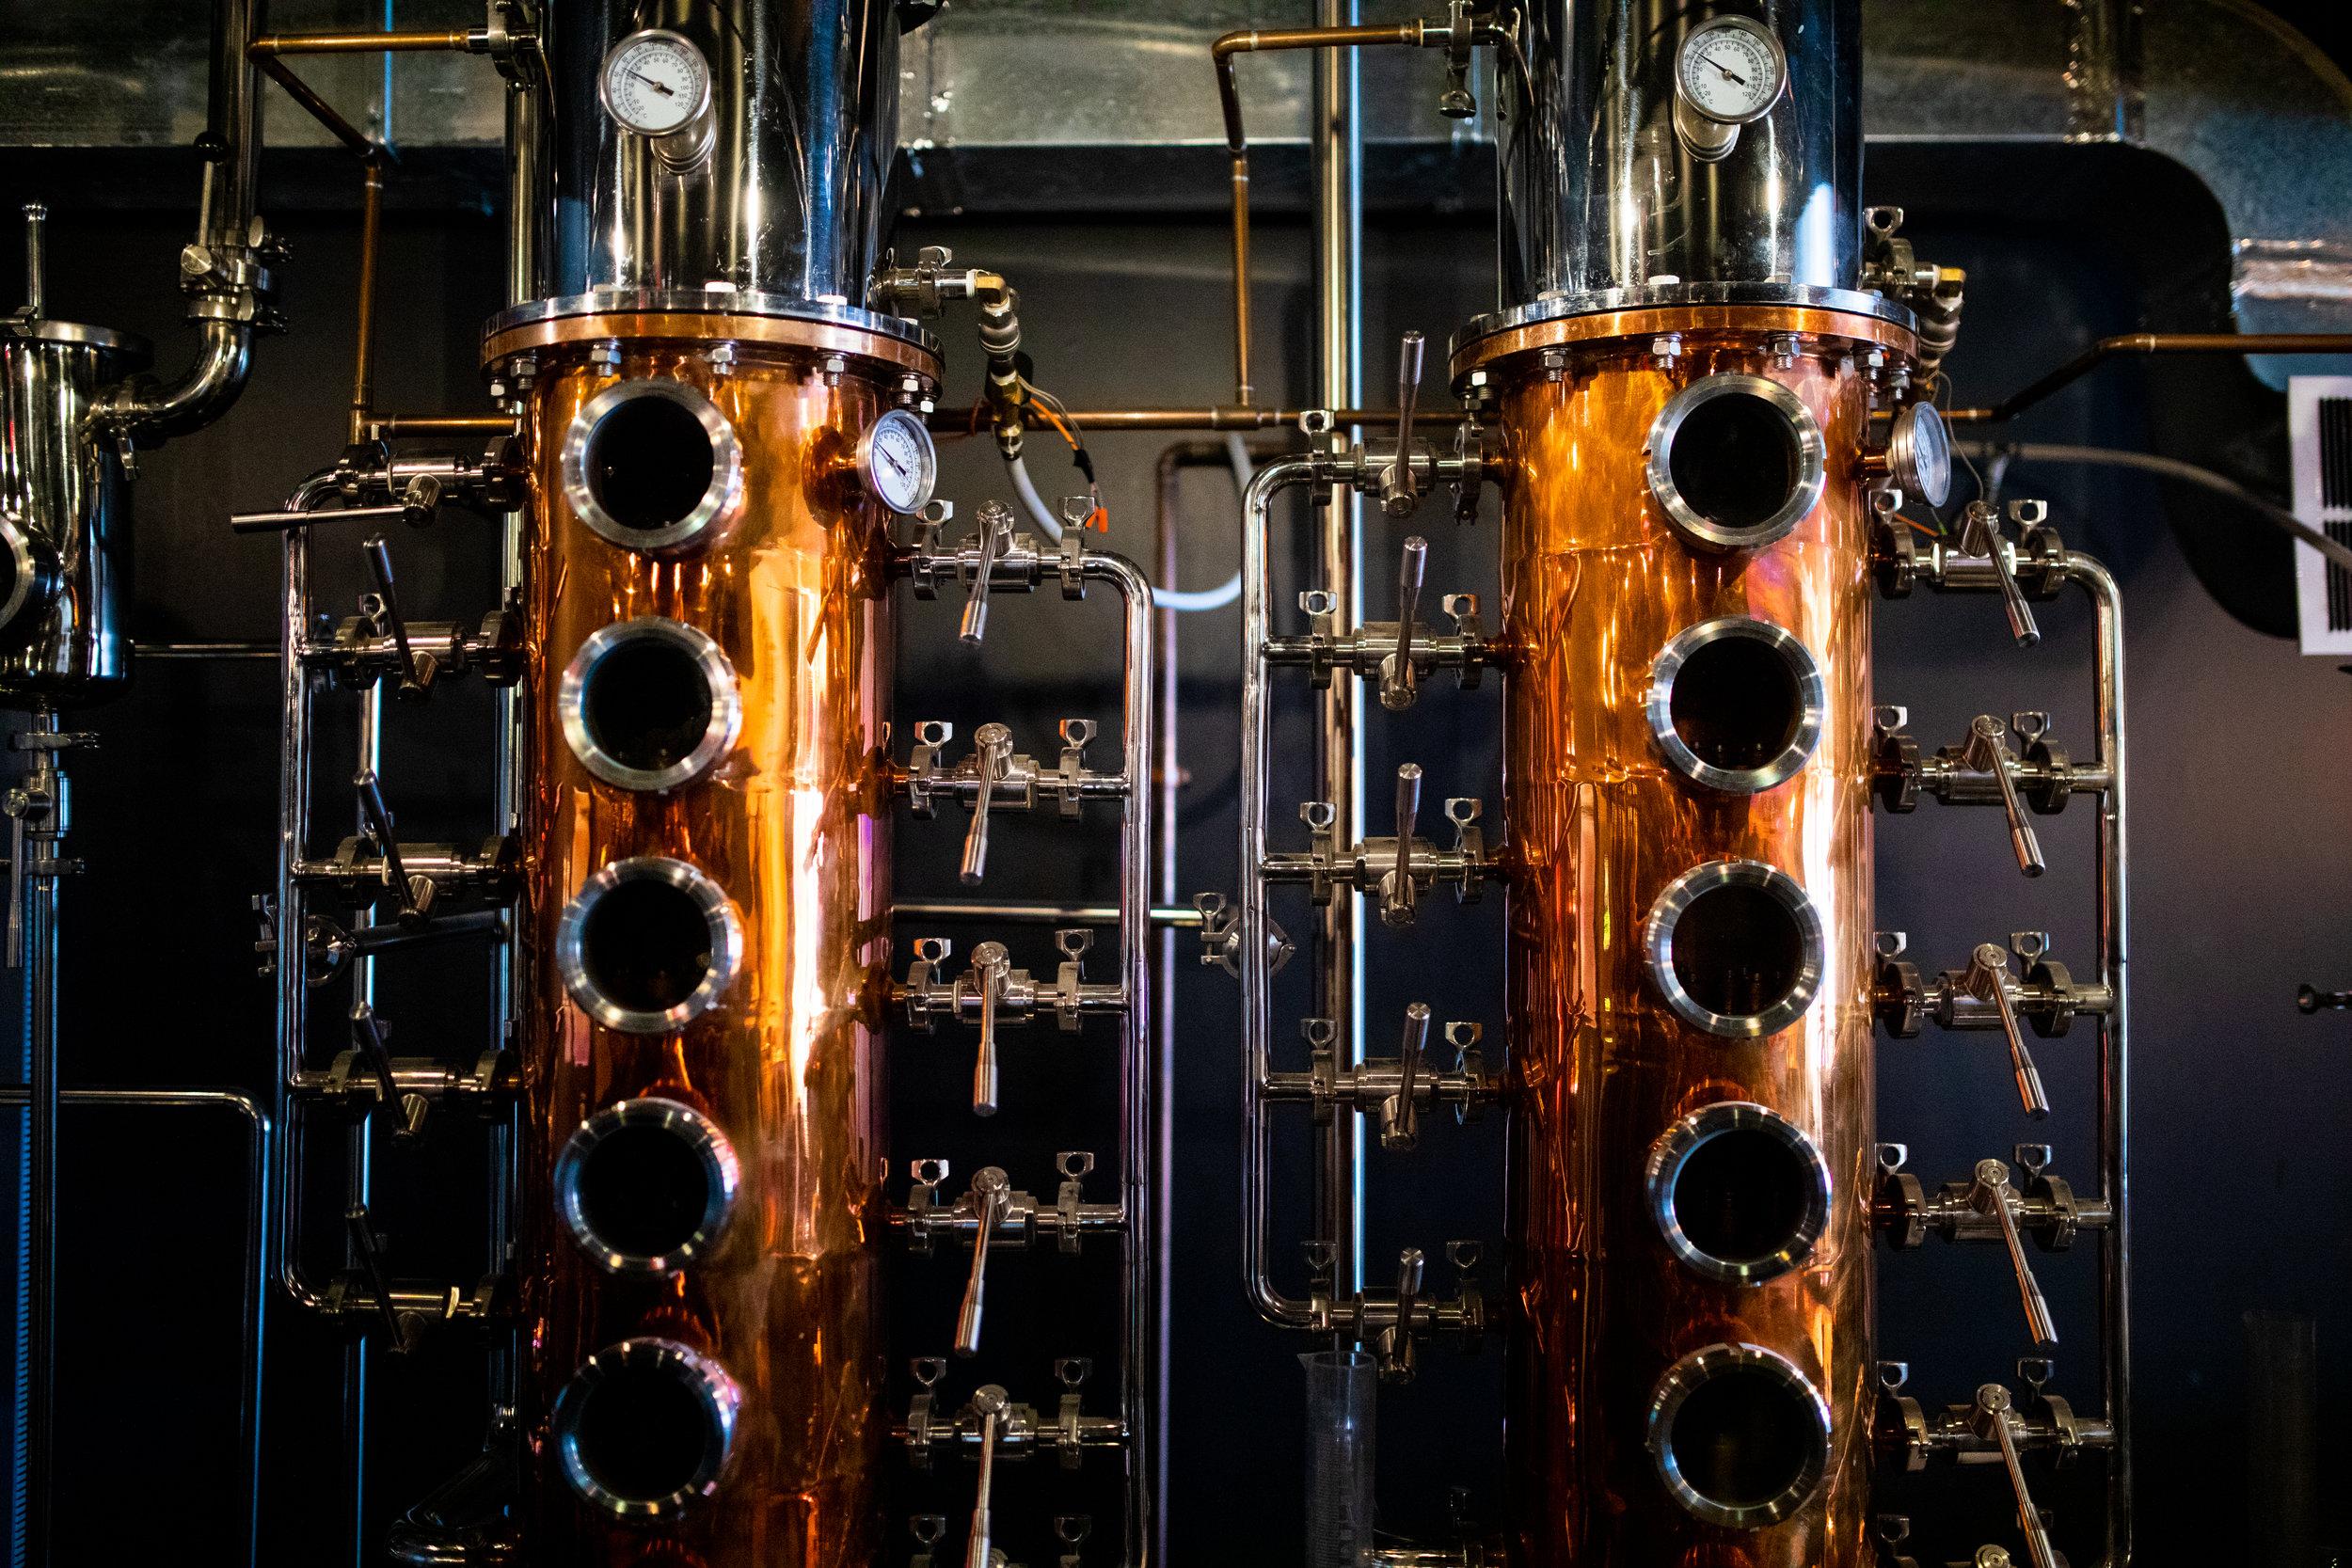 Cole Hofstra - http---www.colehofstra.com - Cole Hofstra Photography - Monashee distilling - Revelsroke Distilling - Monashee-6.jpg